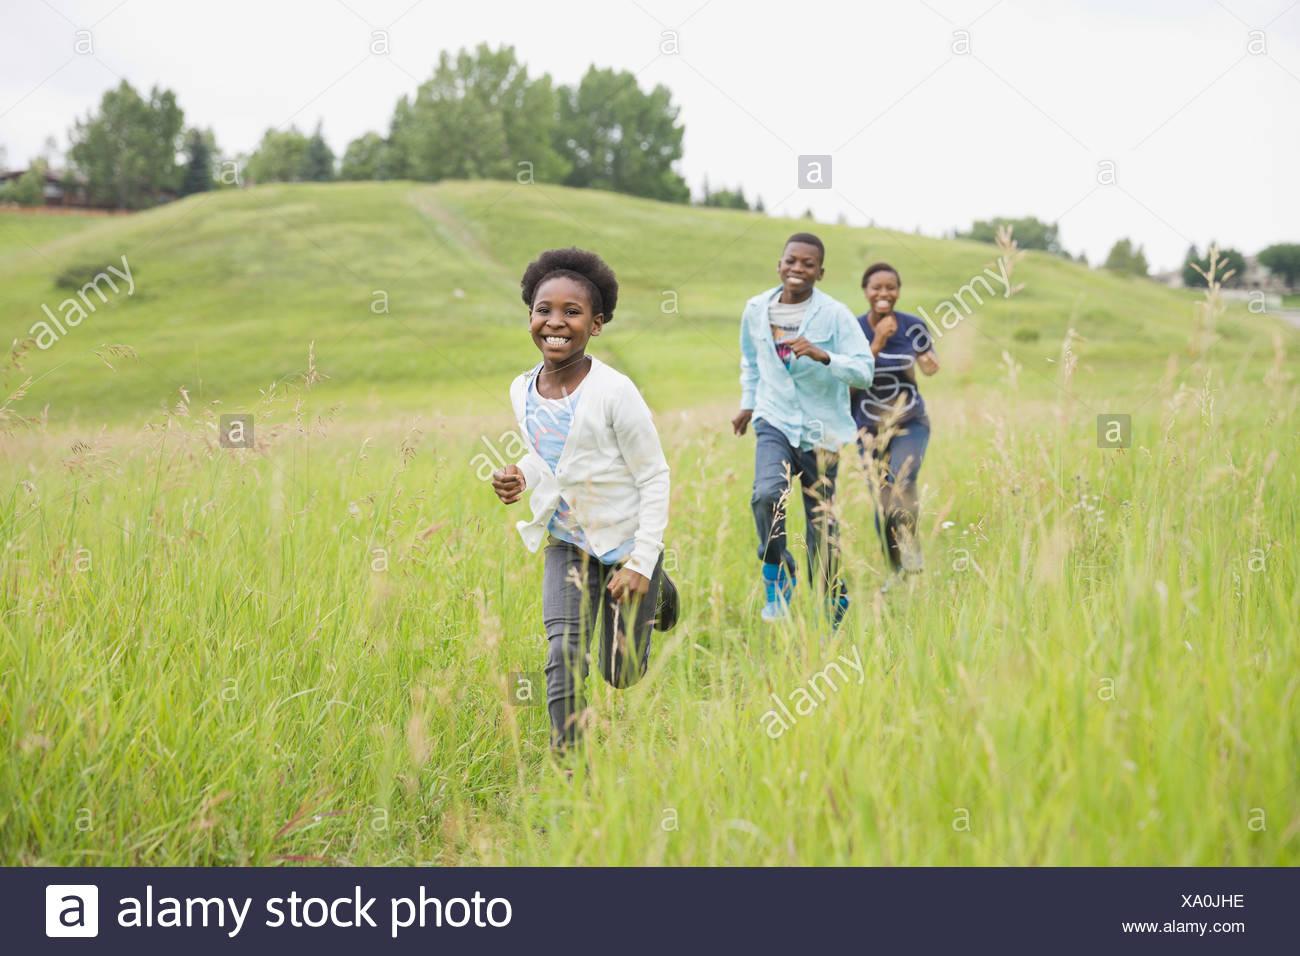 Cheerful siblings running through field - Stock Image